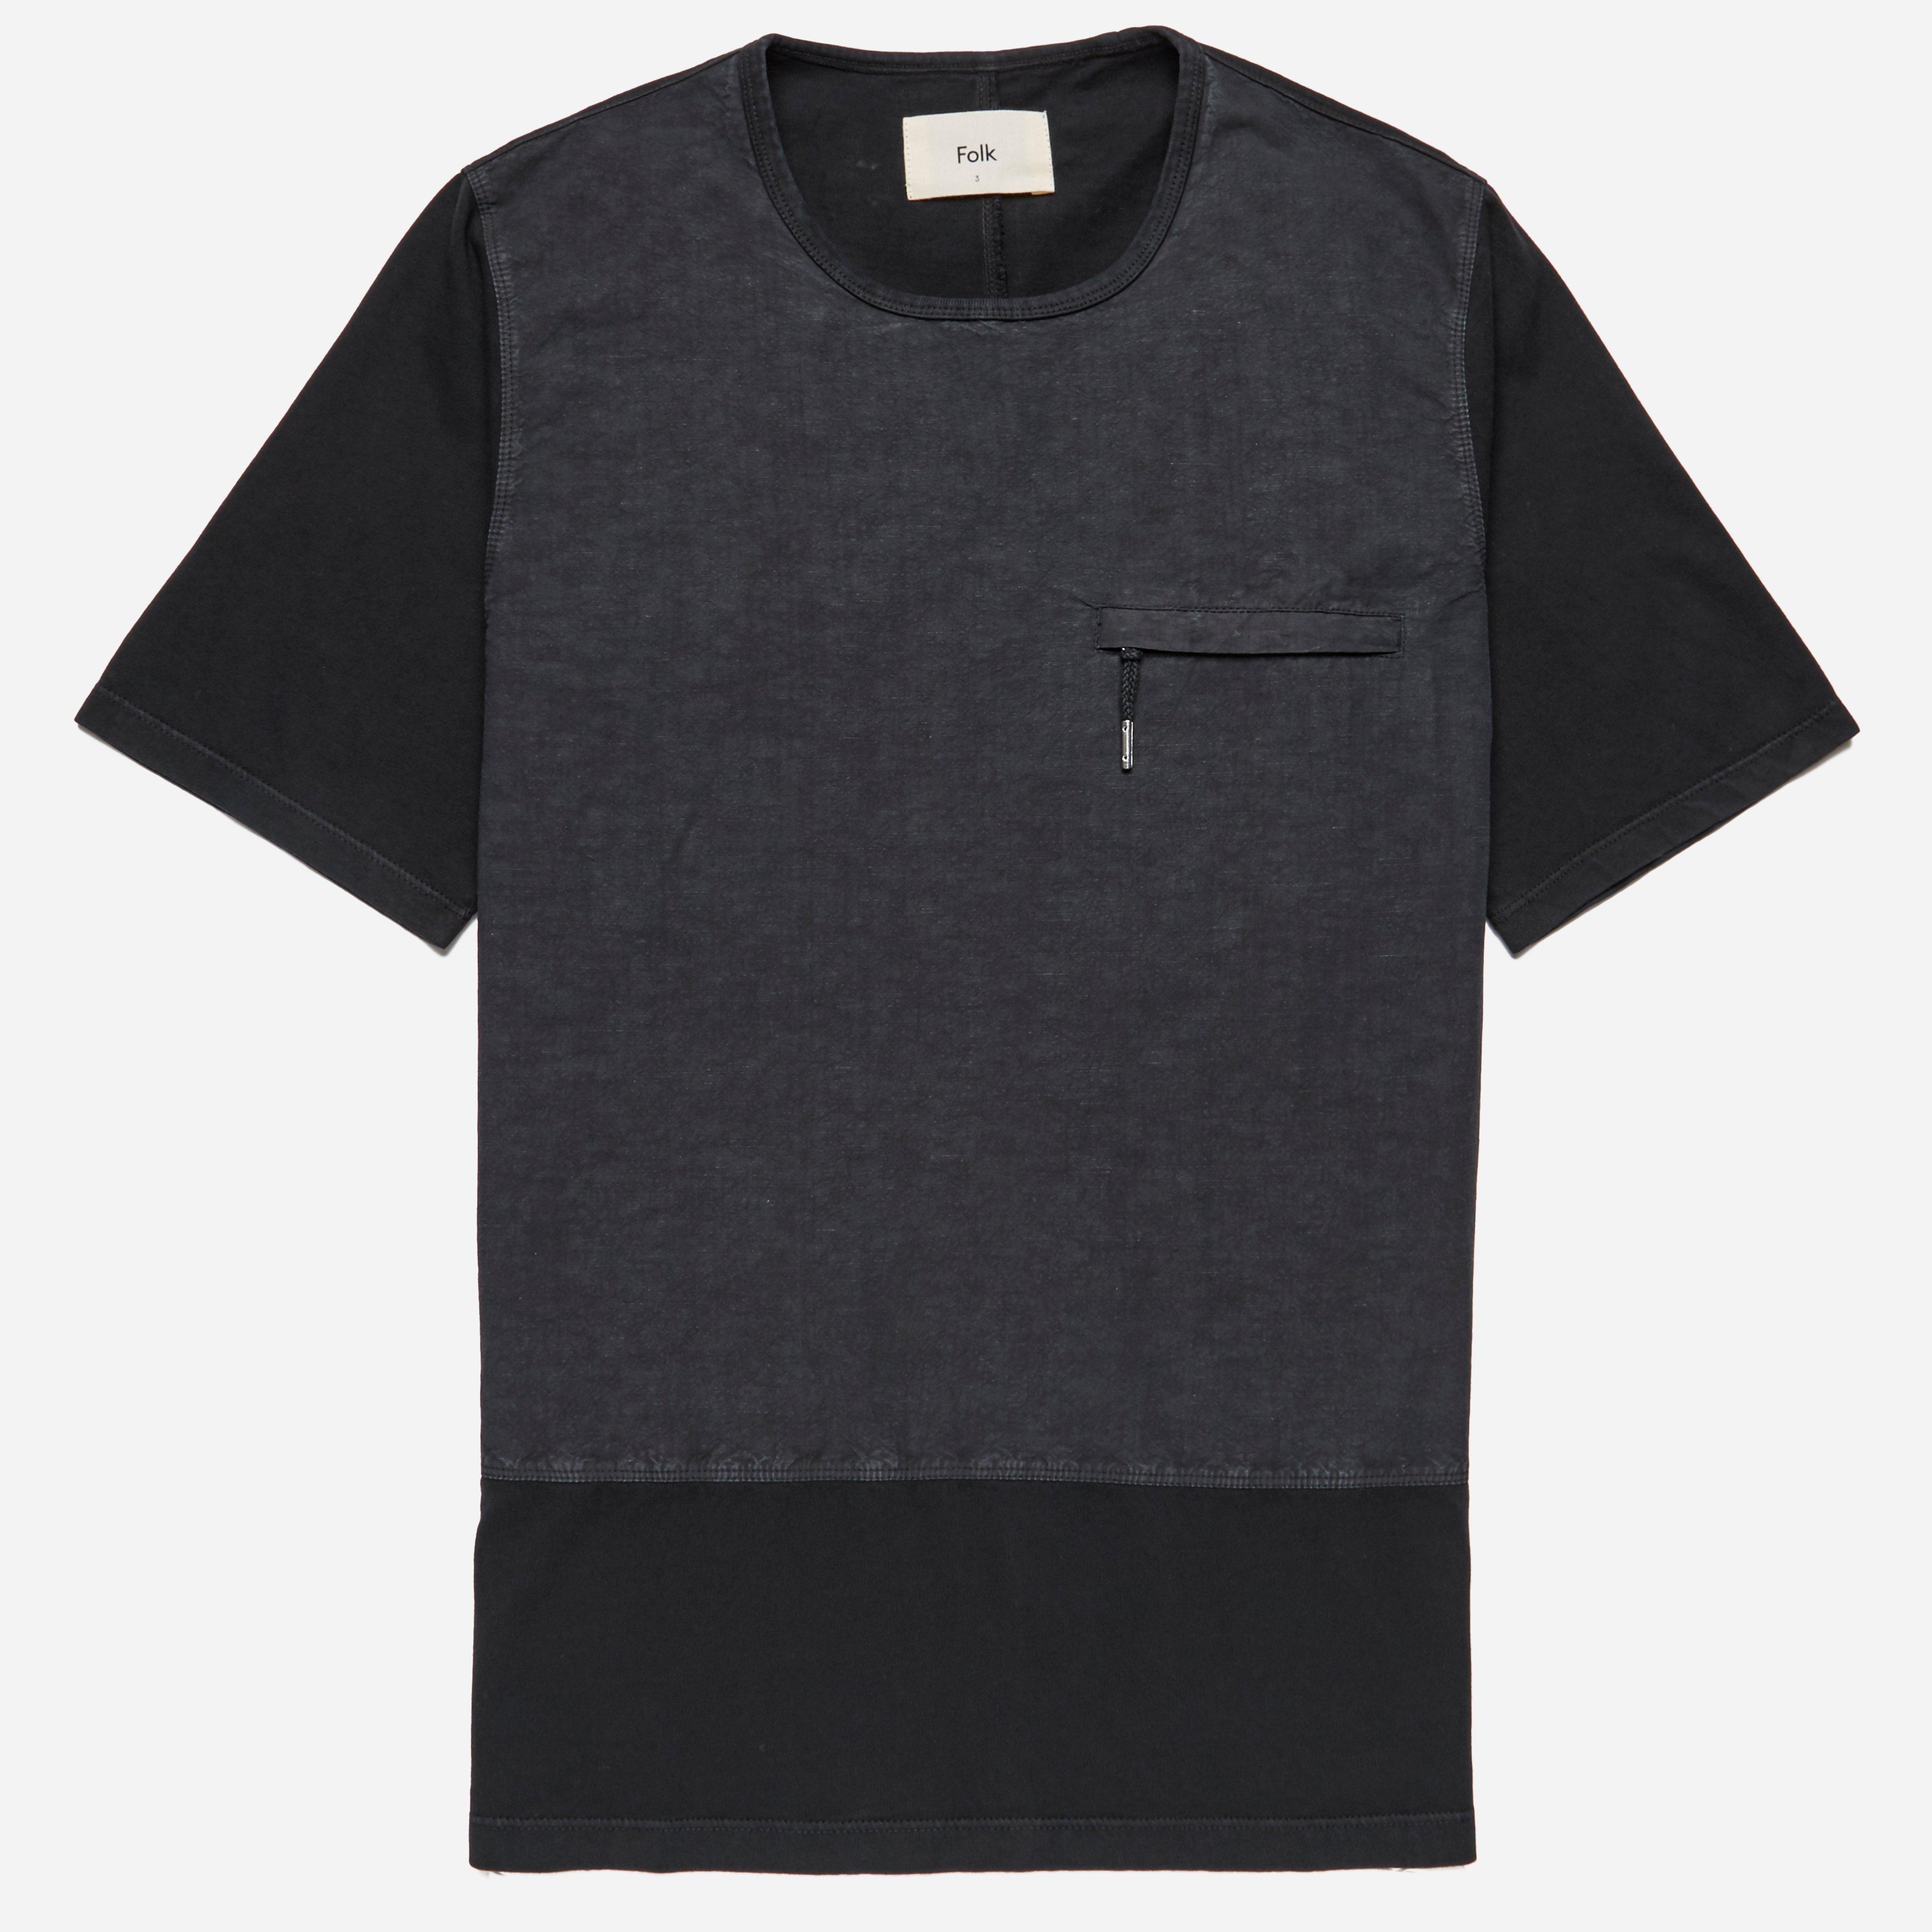 Folk Combination T-shirt